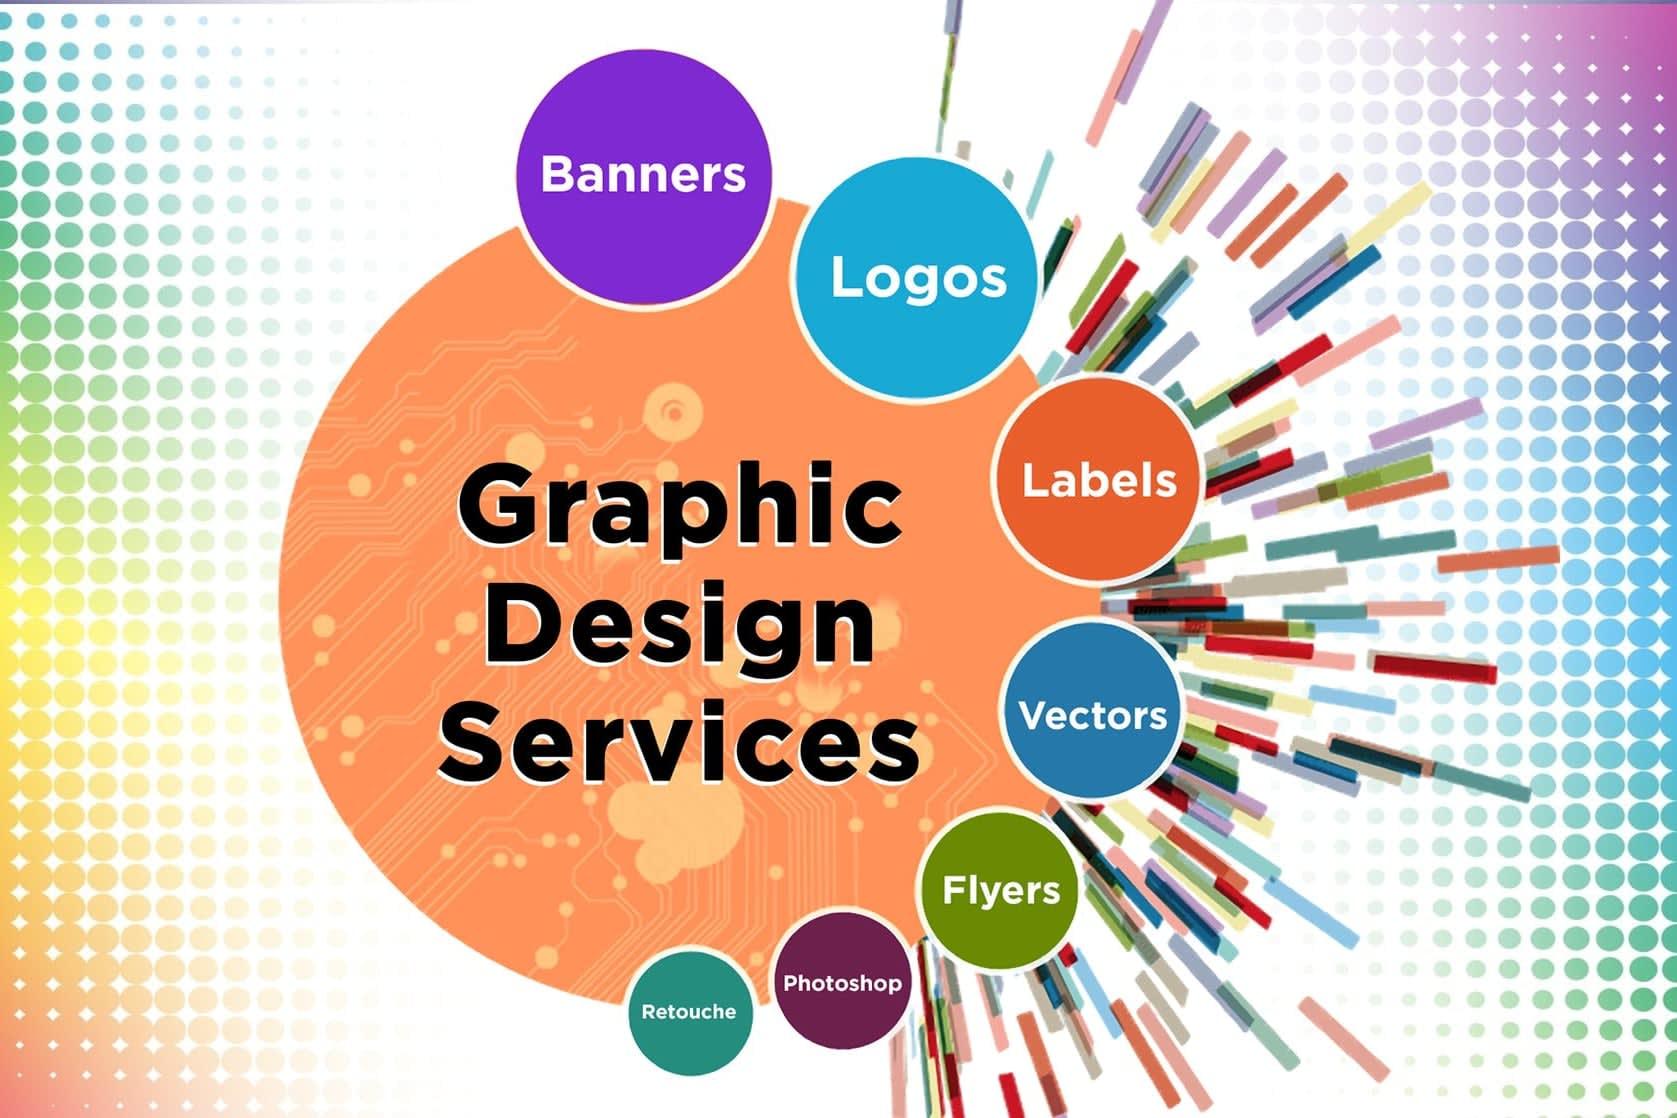 Portfolio for I will do anything graphic design relate